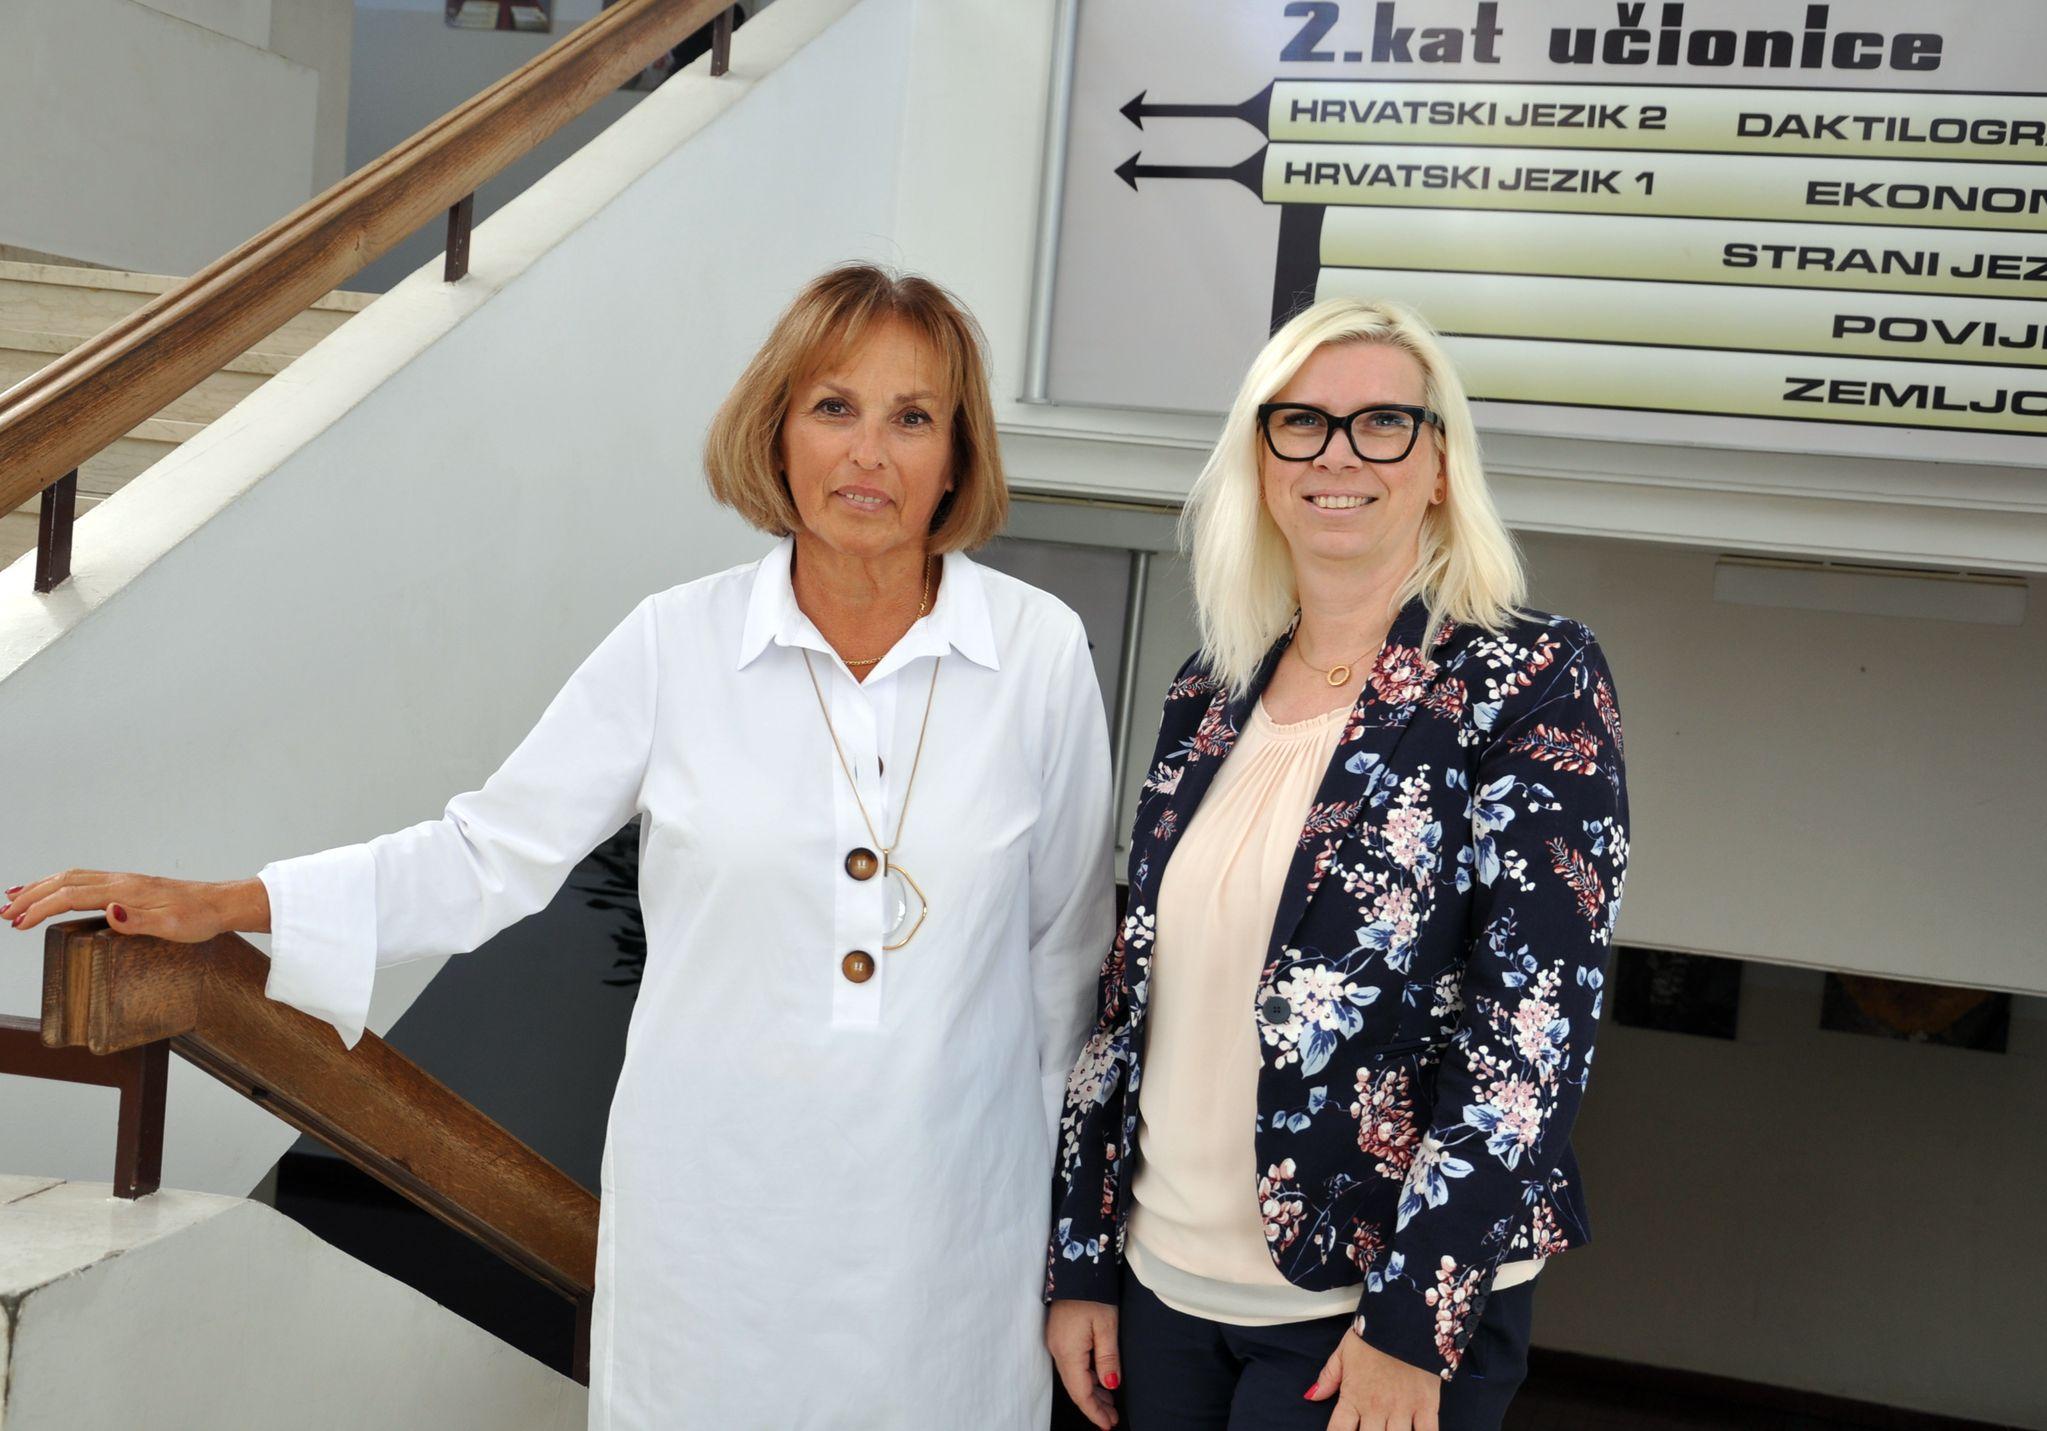 Đurđica Cvitkušić i Ana Pasarić / Snimio Mladen TRINAJSTIĆ